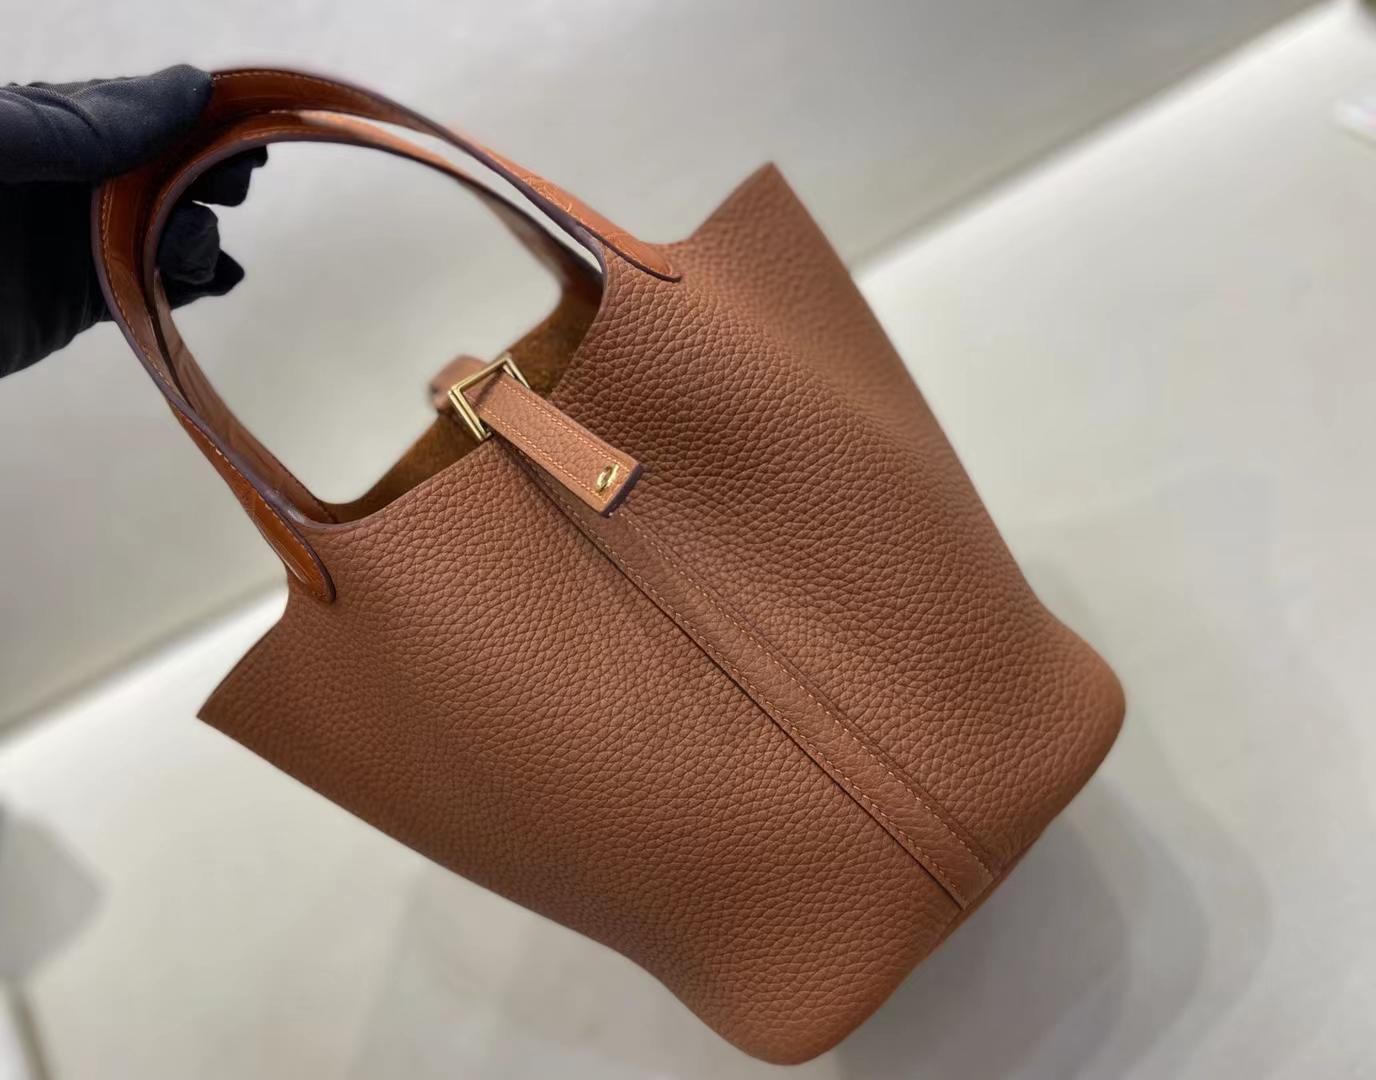 Hermès(爱马仕)Picotin 菜篮子 金棕色 TC 拼 鳄鱼手腕 18cm 金扣 顶级纯手工